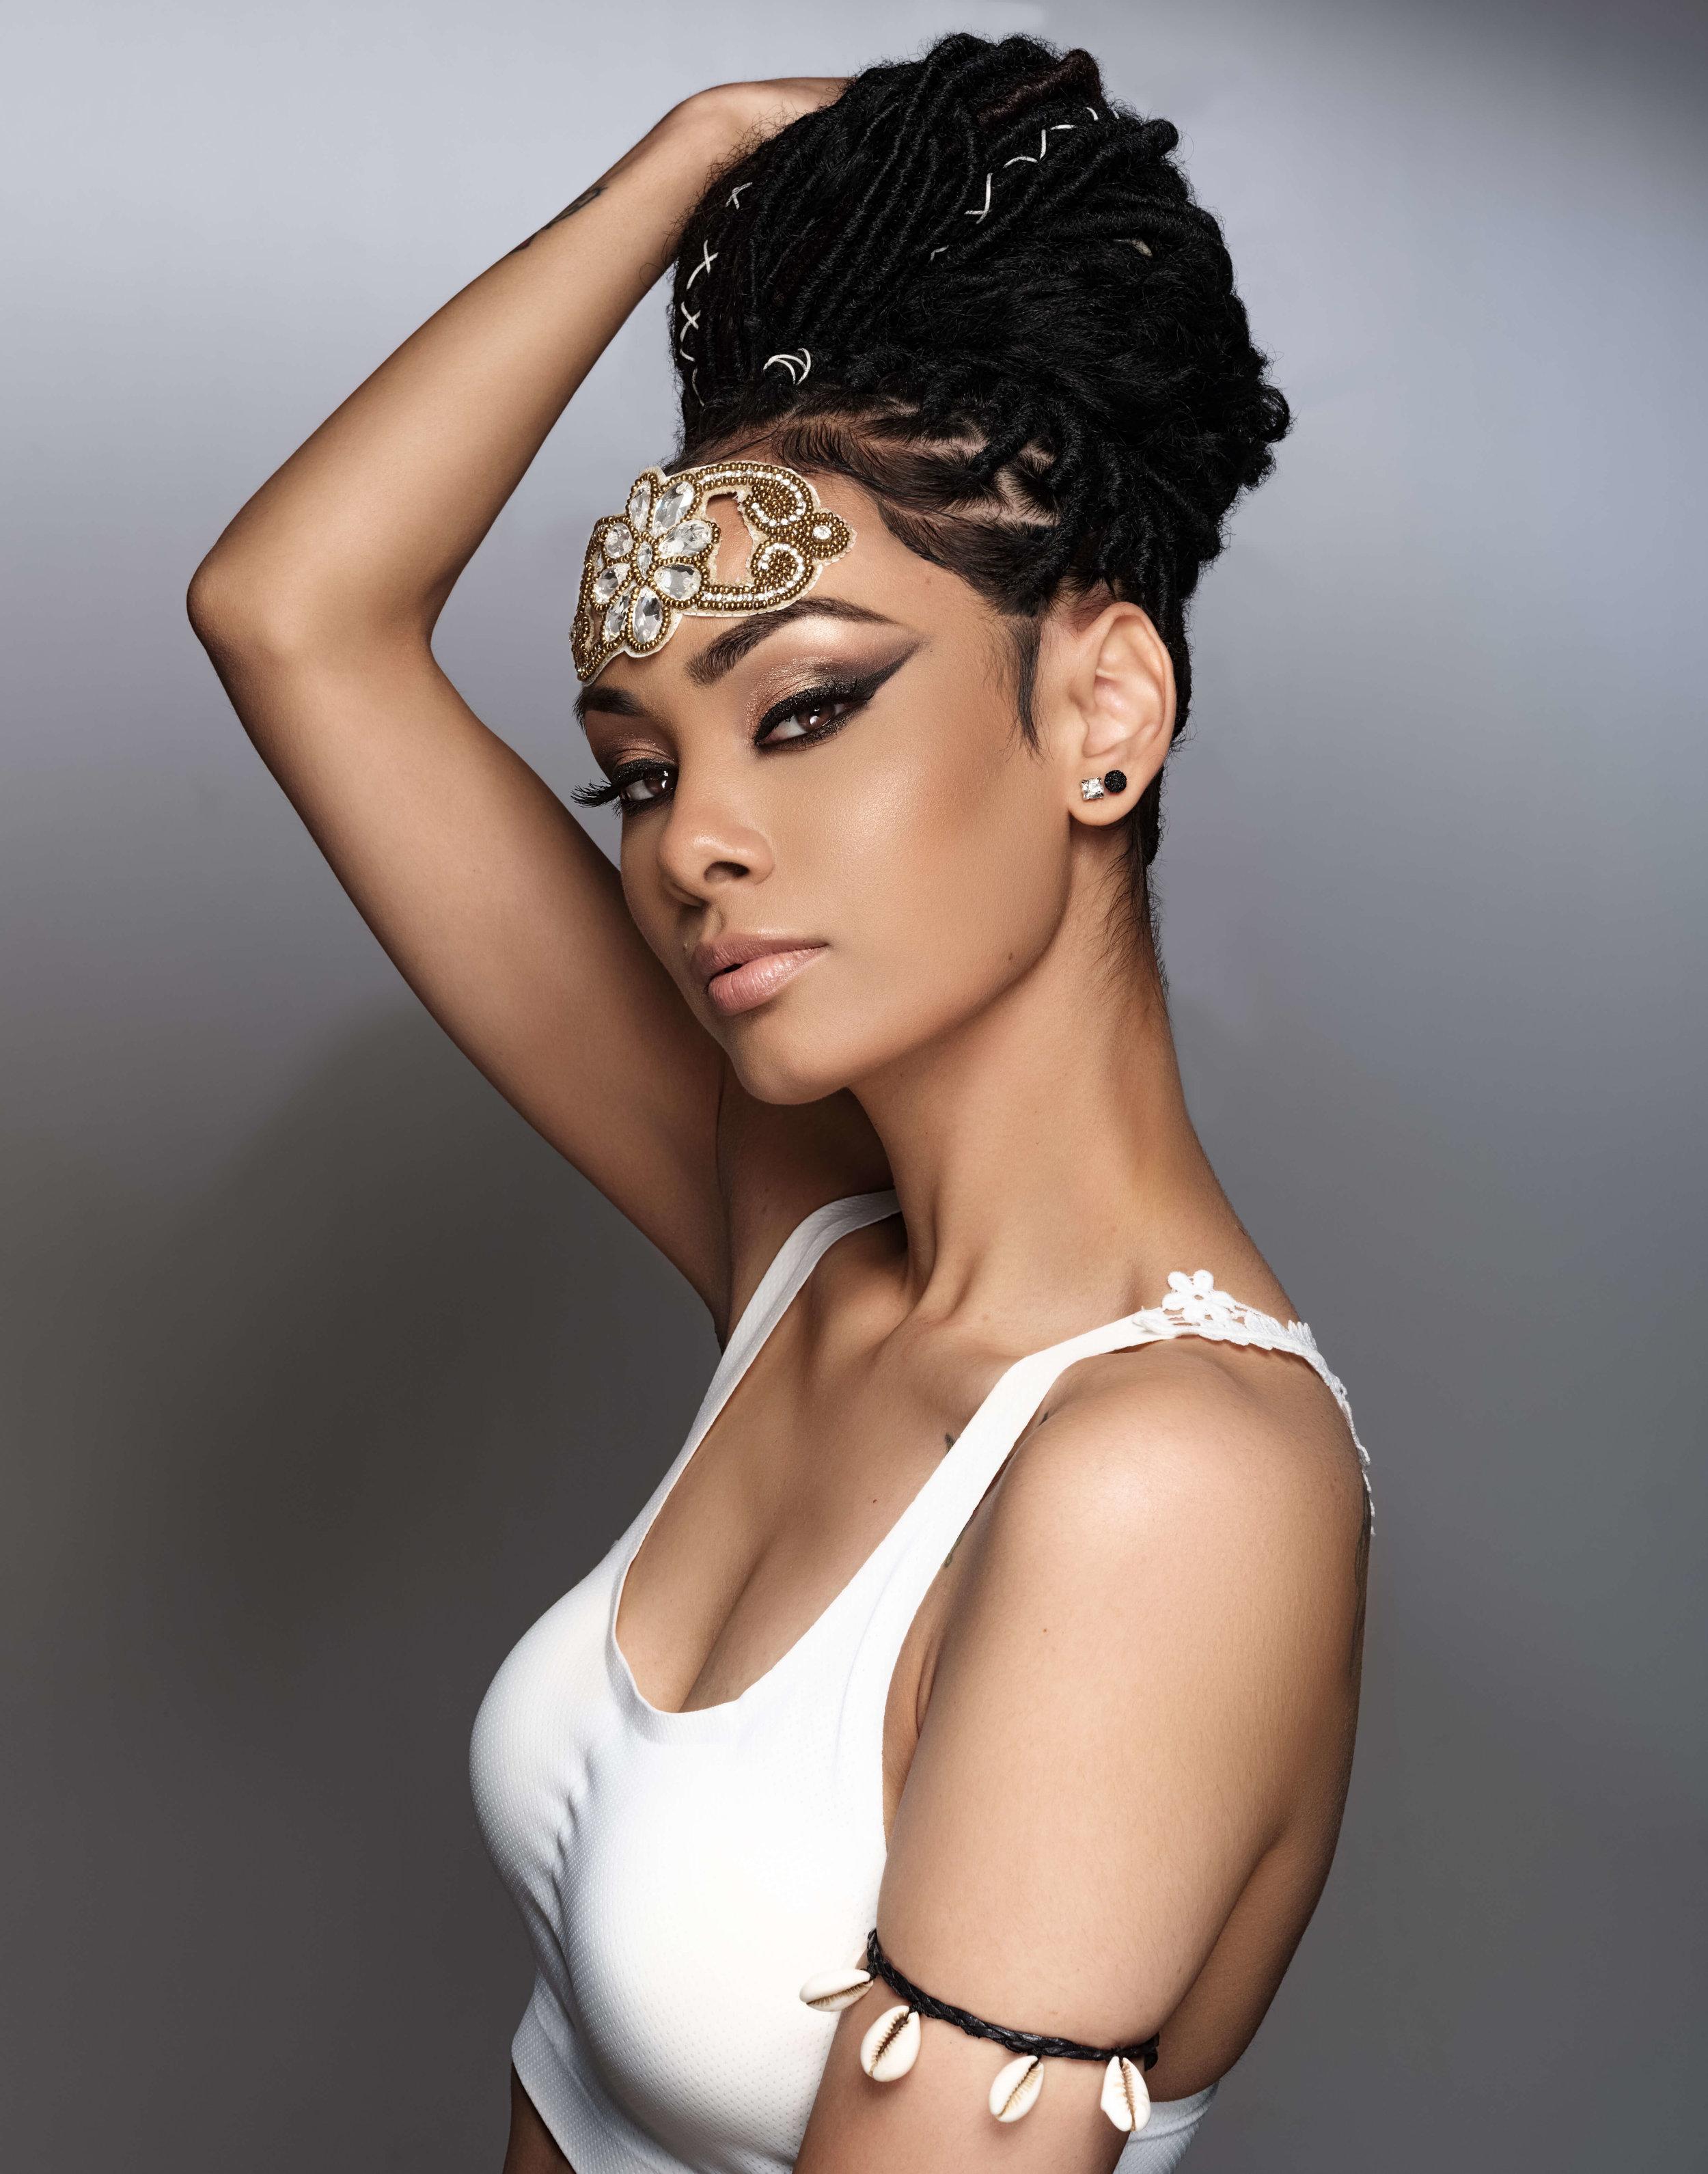 camille-ariane-makeup-editorial-10.JPG